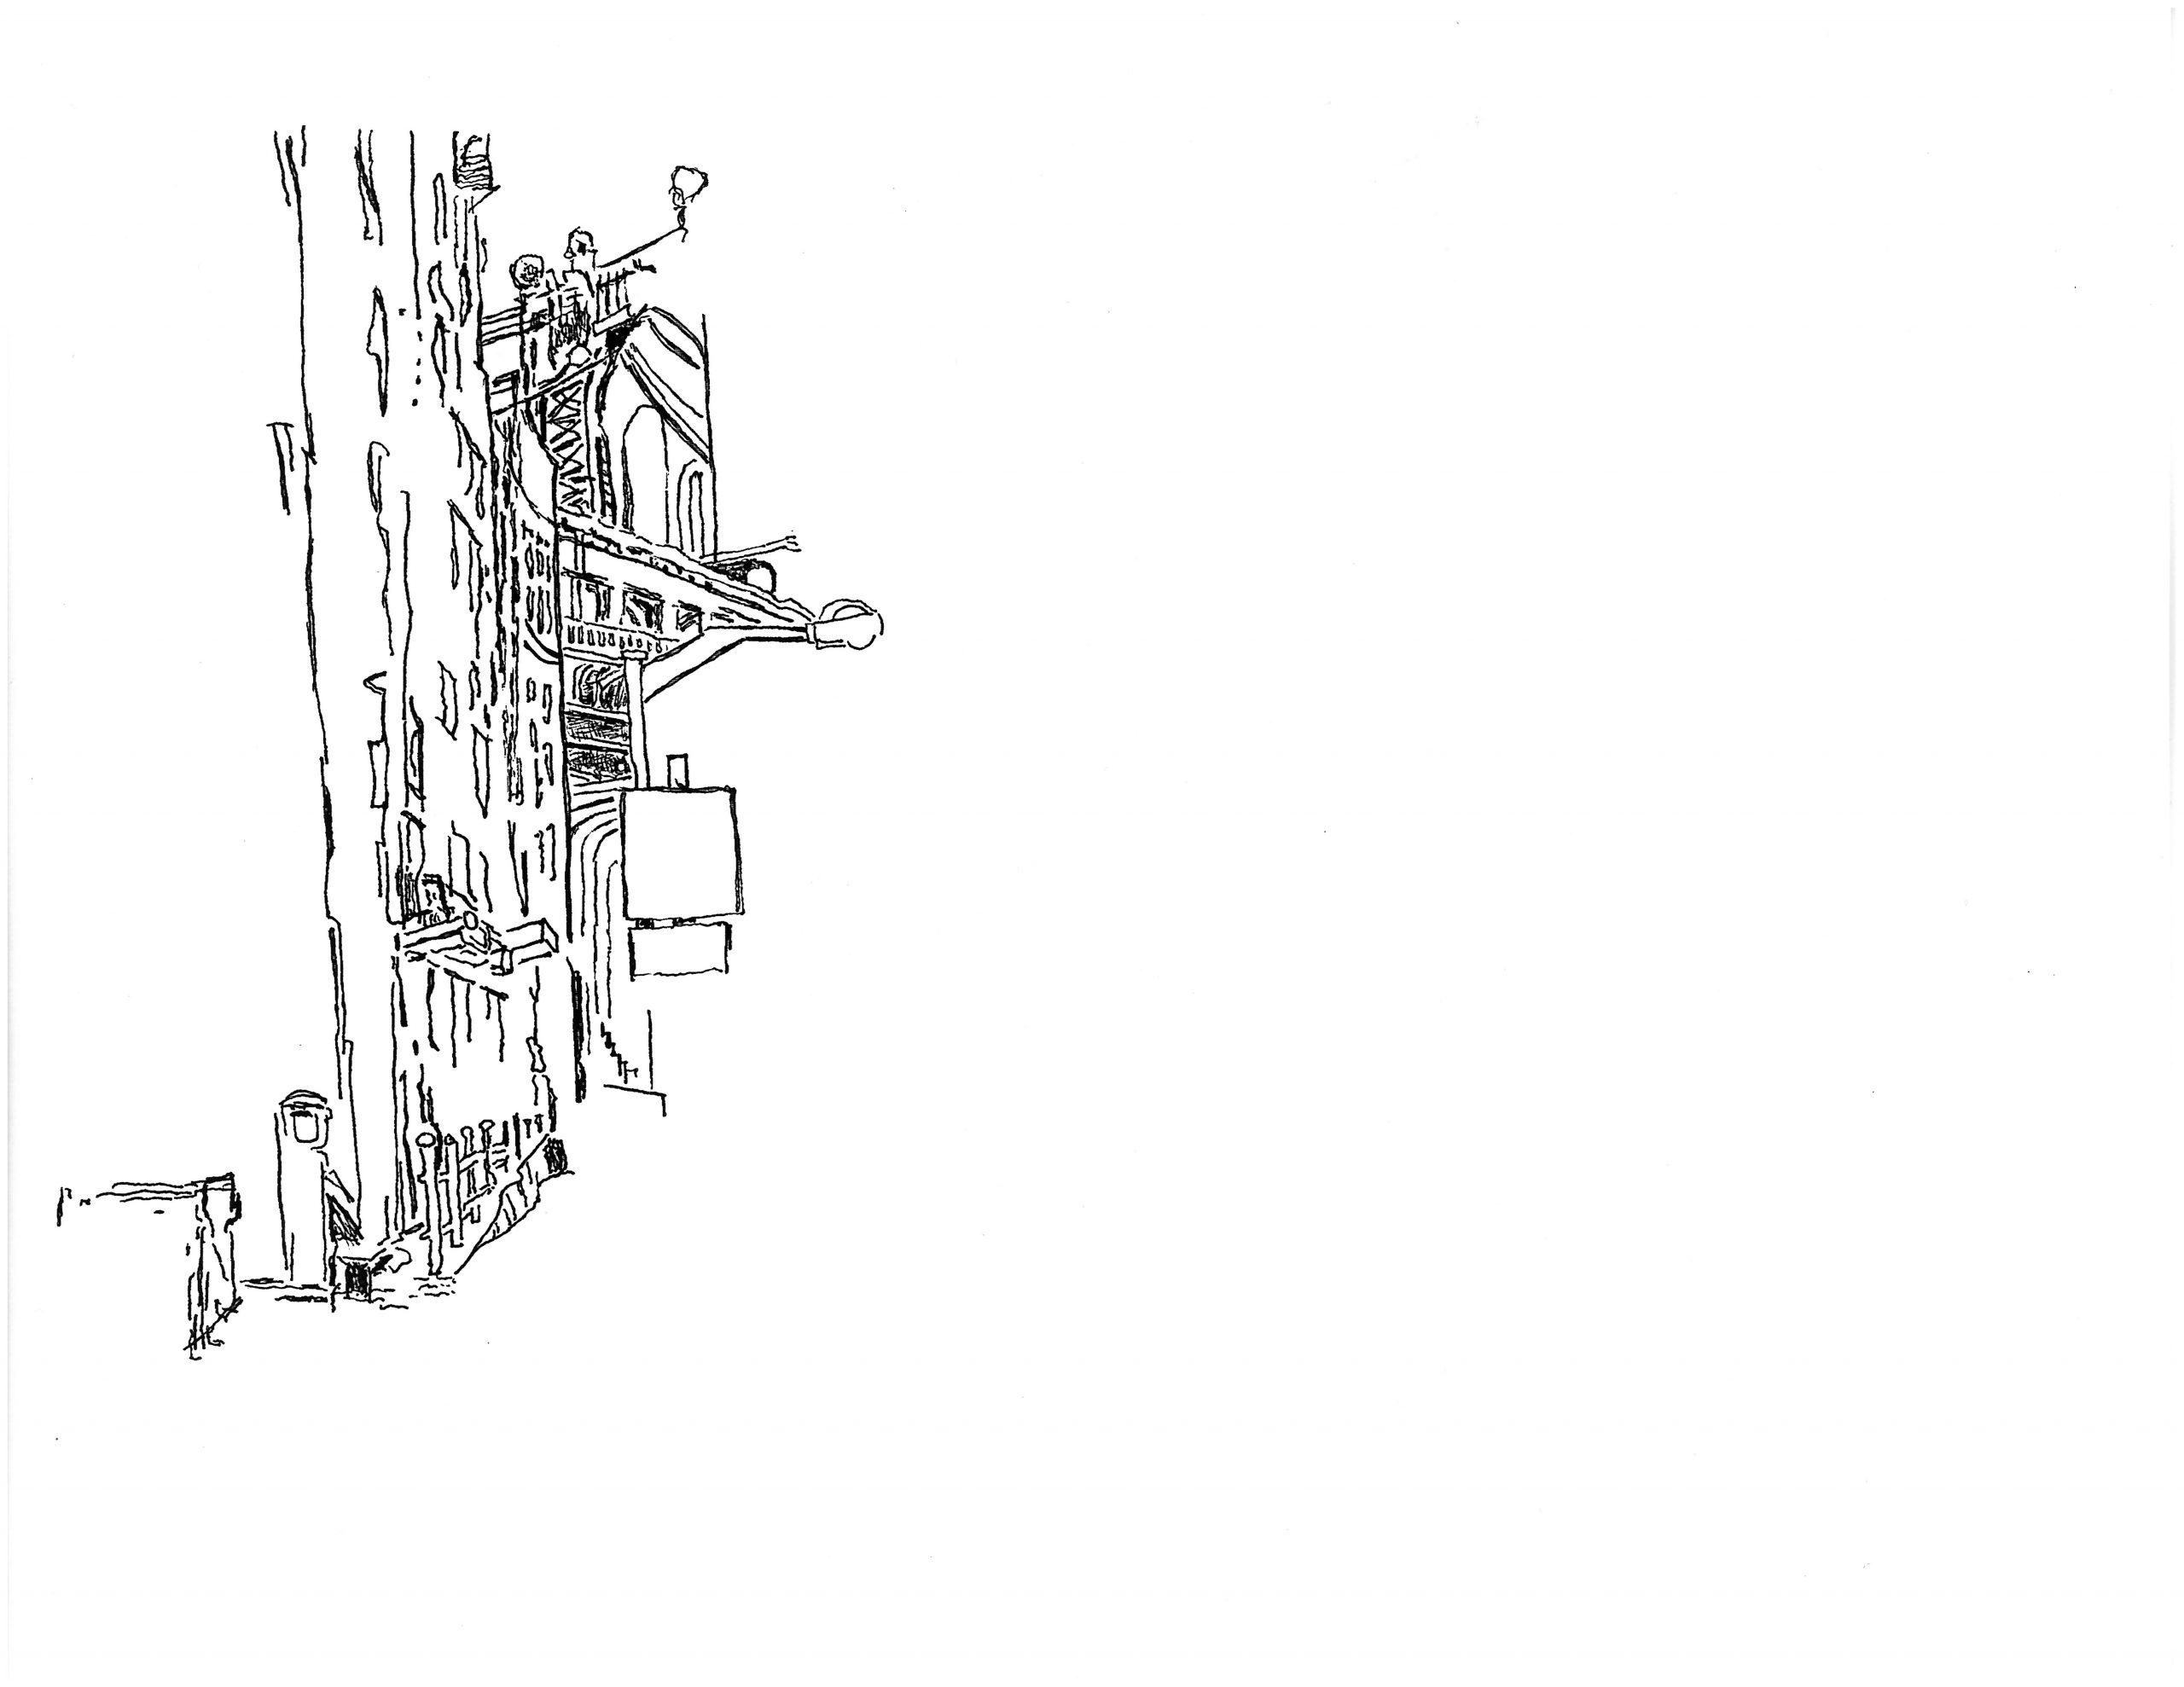 Drawing the Manhattan Bridge from Dumbo | 01.16.2021